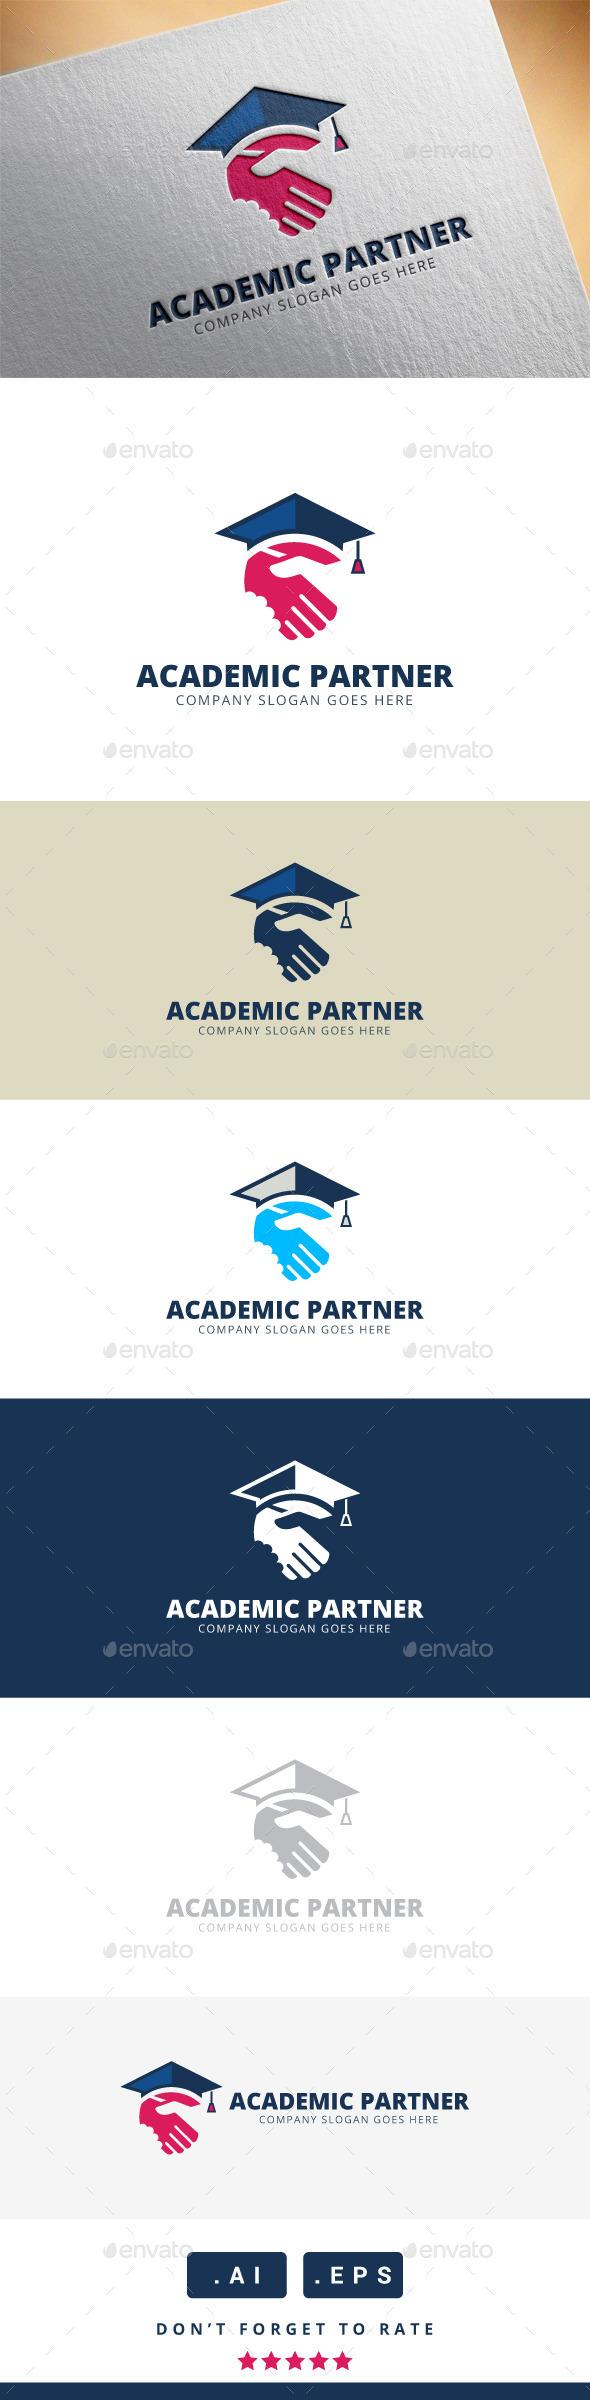 GraphicRiver Academic Partner Logo 11340032